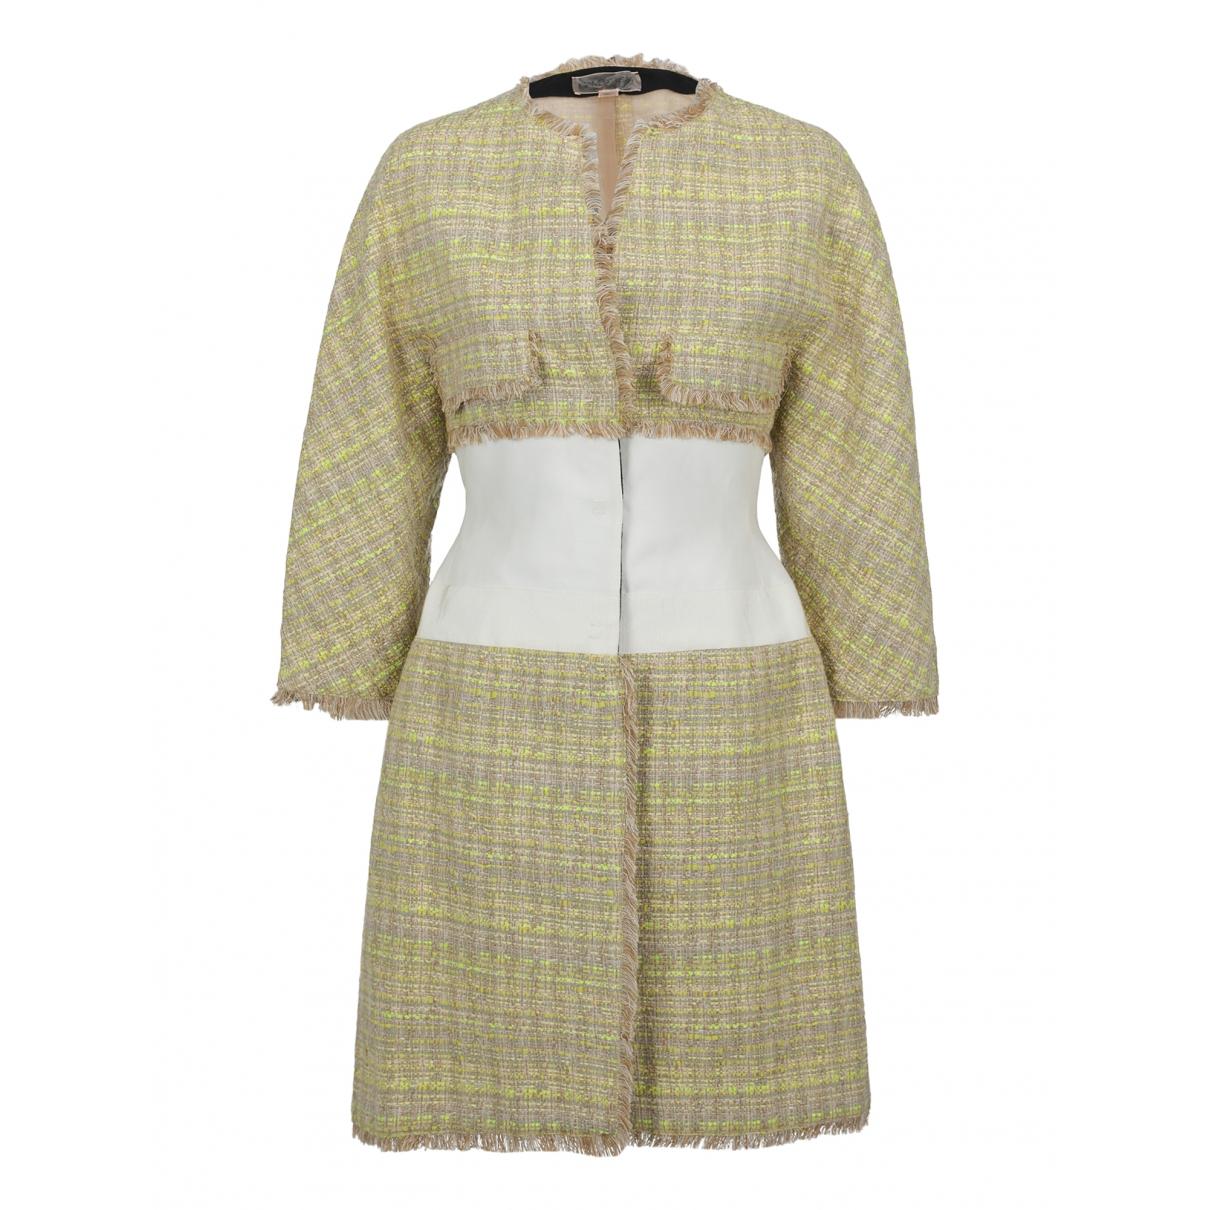 Giambattista Valli \N Yellow coat for Women 40 IT